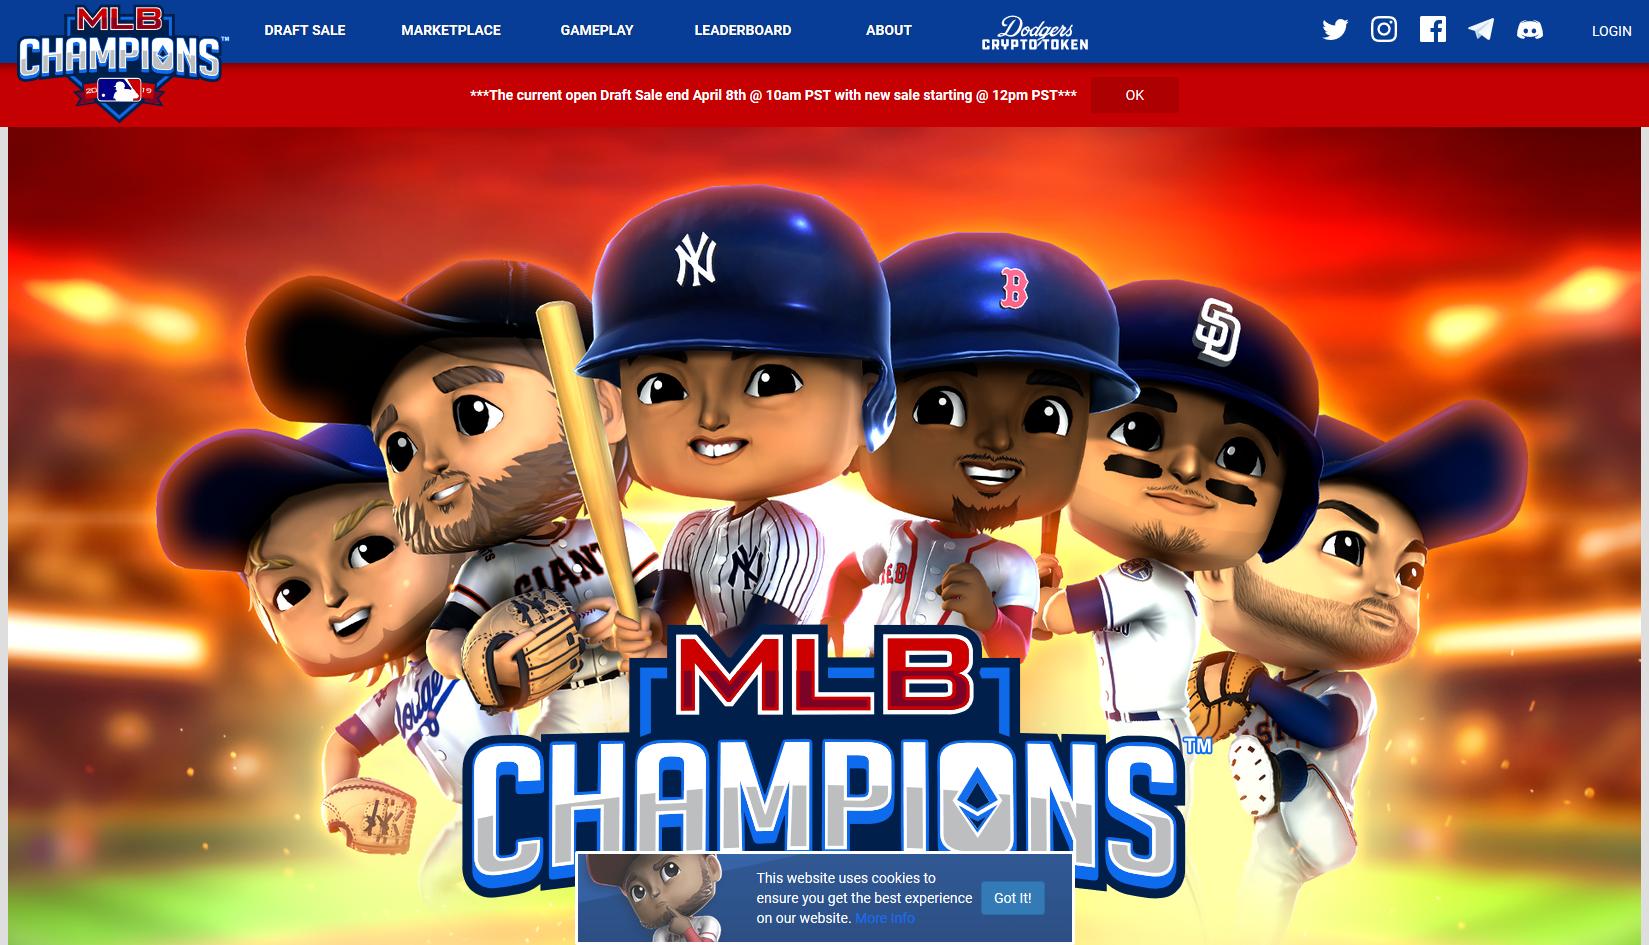 MLB CHAMPIONS公式ページ